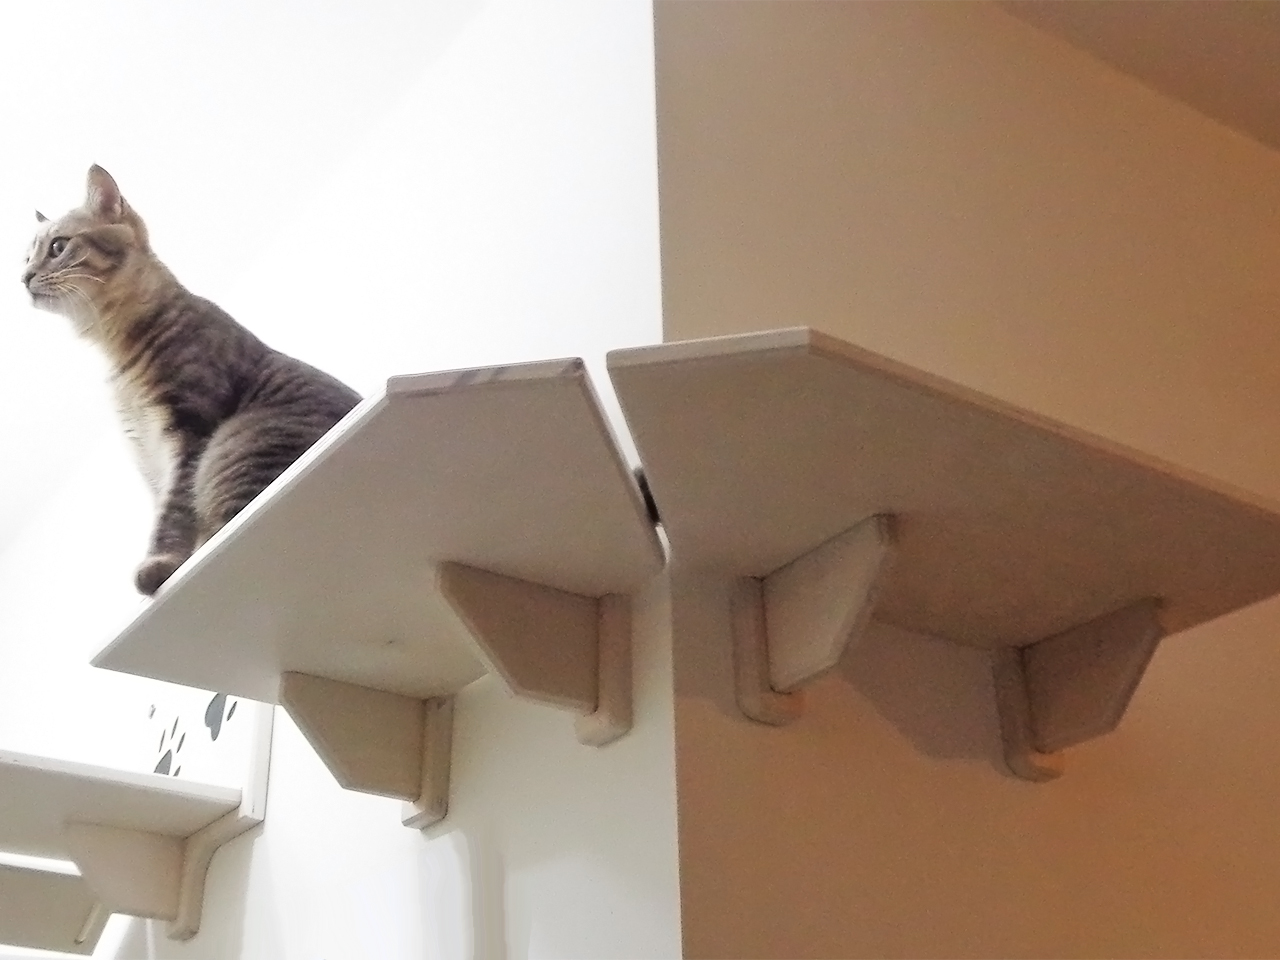 Mobili Per Gatti Ikea : Mensole per gatti ikea u idea d immagine di decorazione